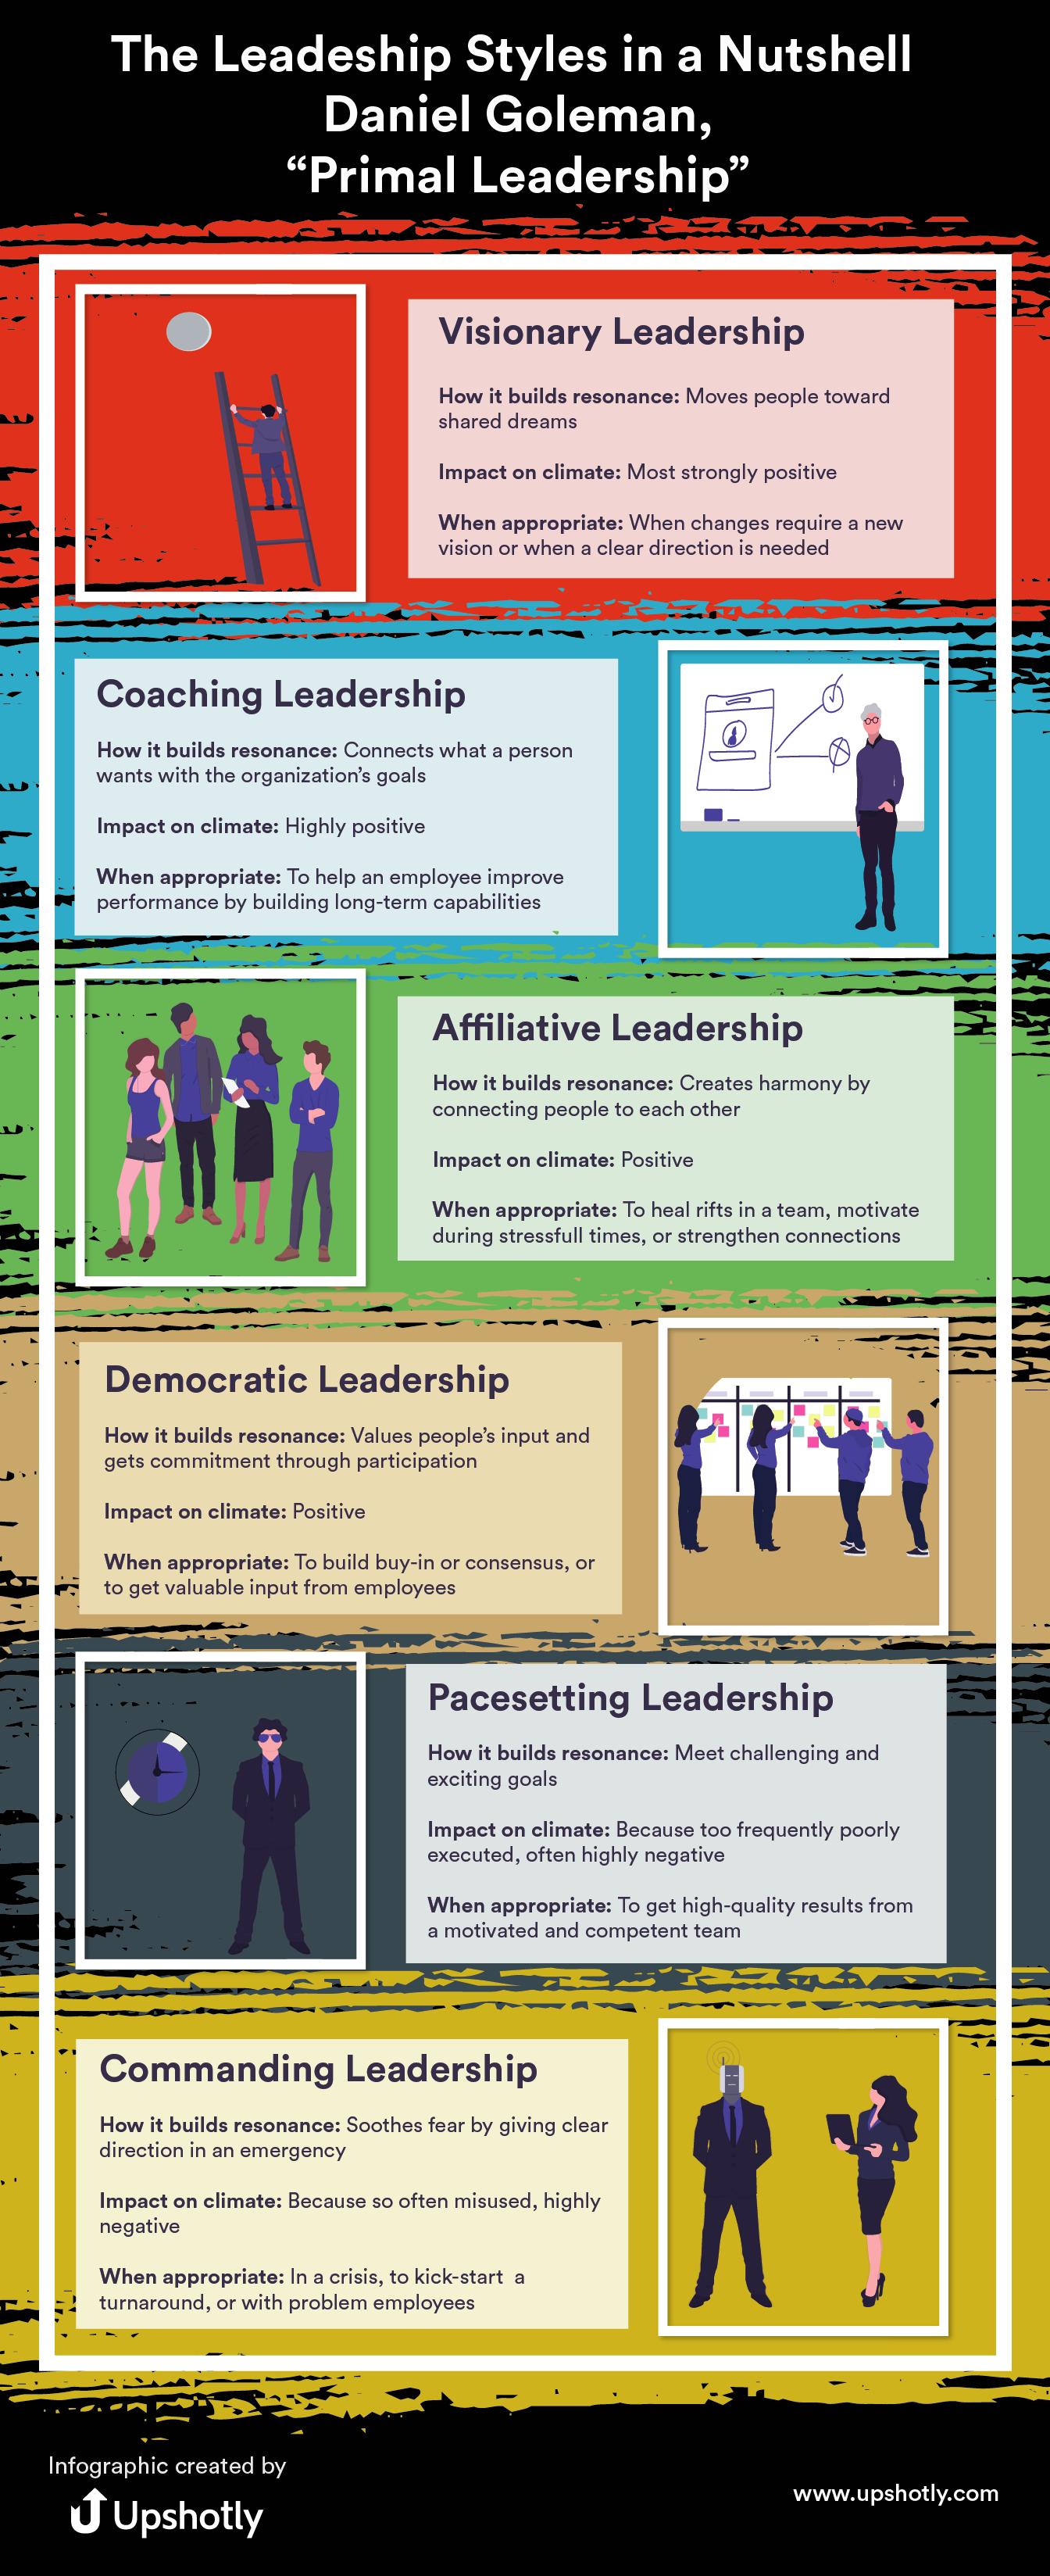 Daniel Goleman six leadership styles